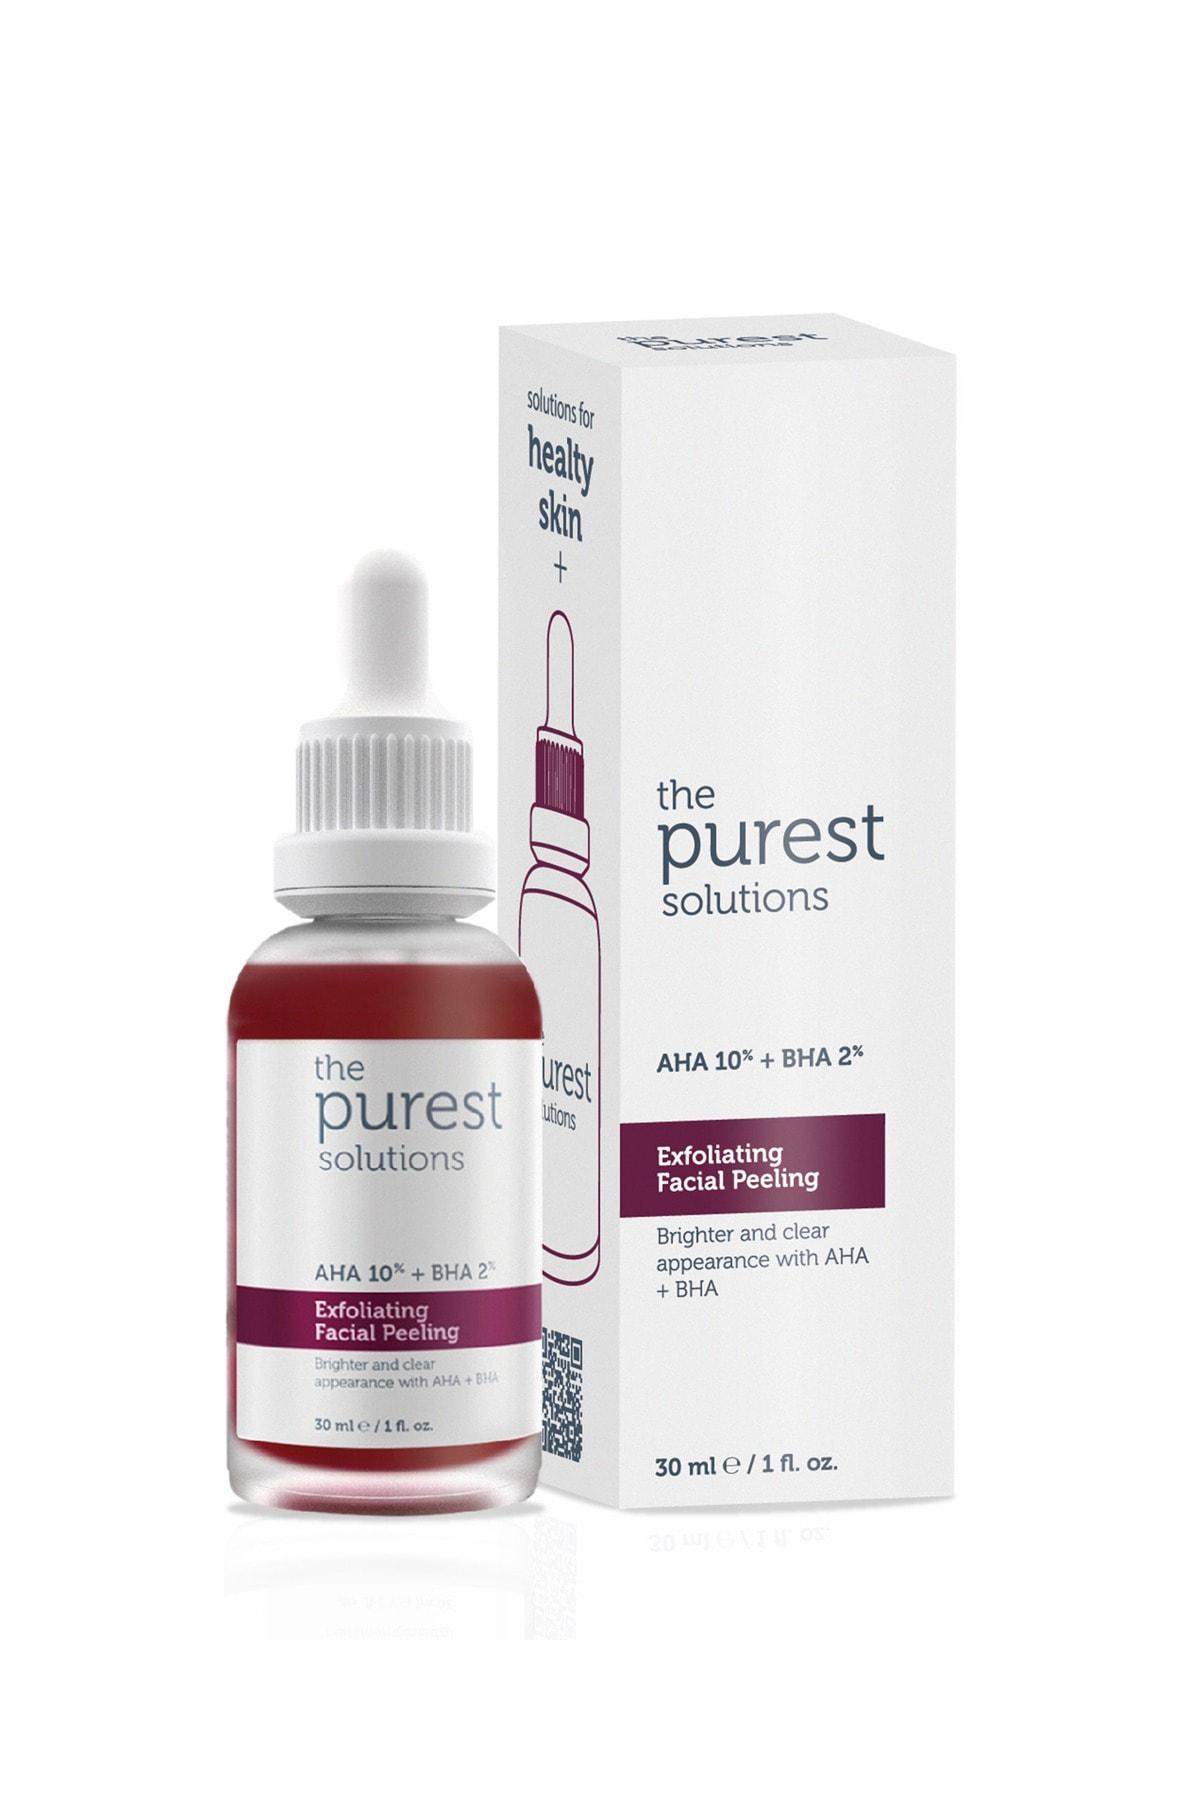 The Purest Solutions Canlandırıcı & Cilt Tonu Eşitleyici Yüz Peeling Serum 30 Ml (aha 10% + Bha 2%) 1